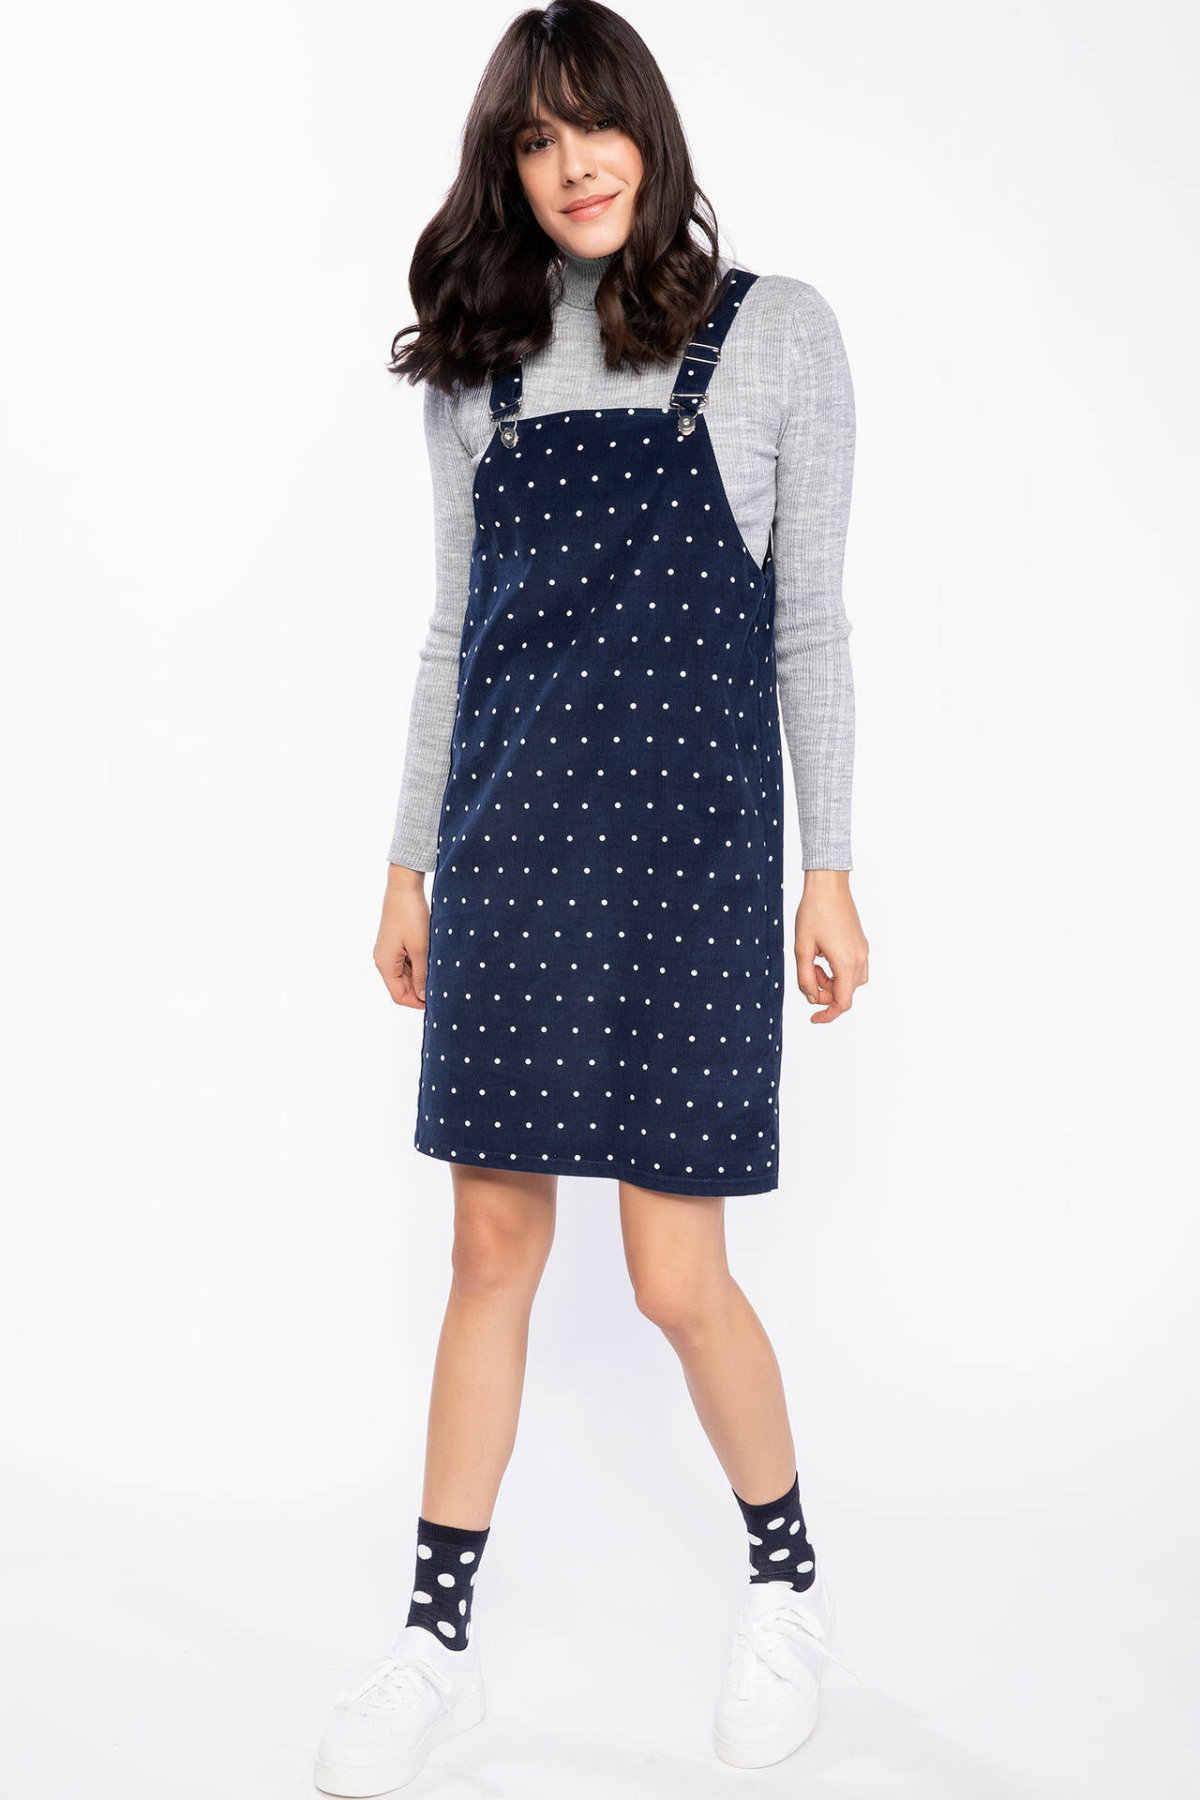 DeFacto mode rouge bleu femmes sangle grille robe automne tissé global Mini Dress-J0810AZ18WN-J0810AZ18WN